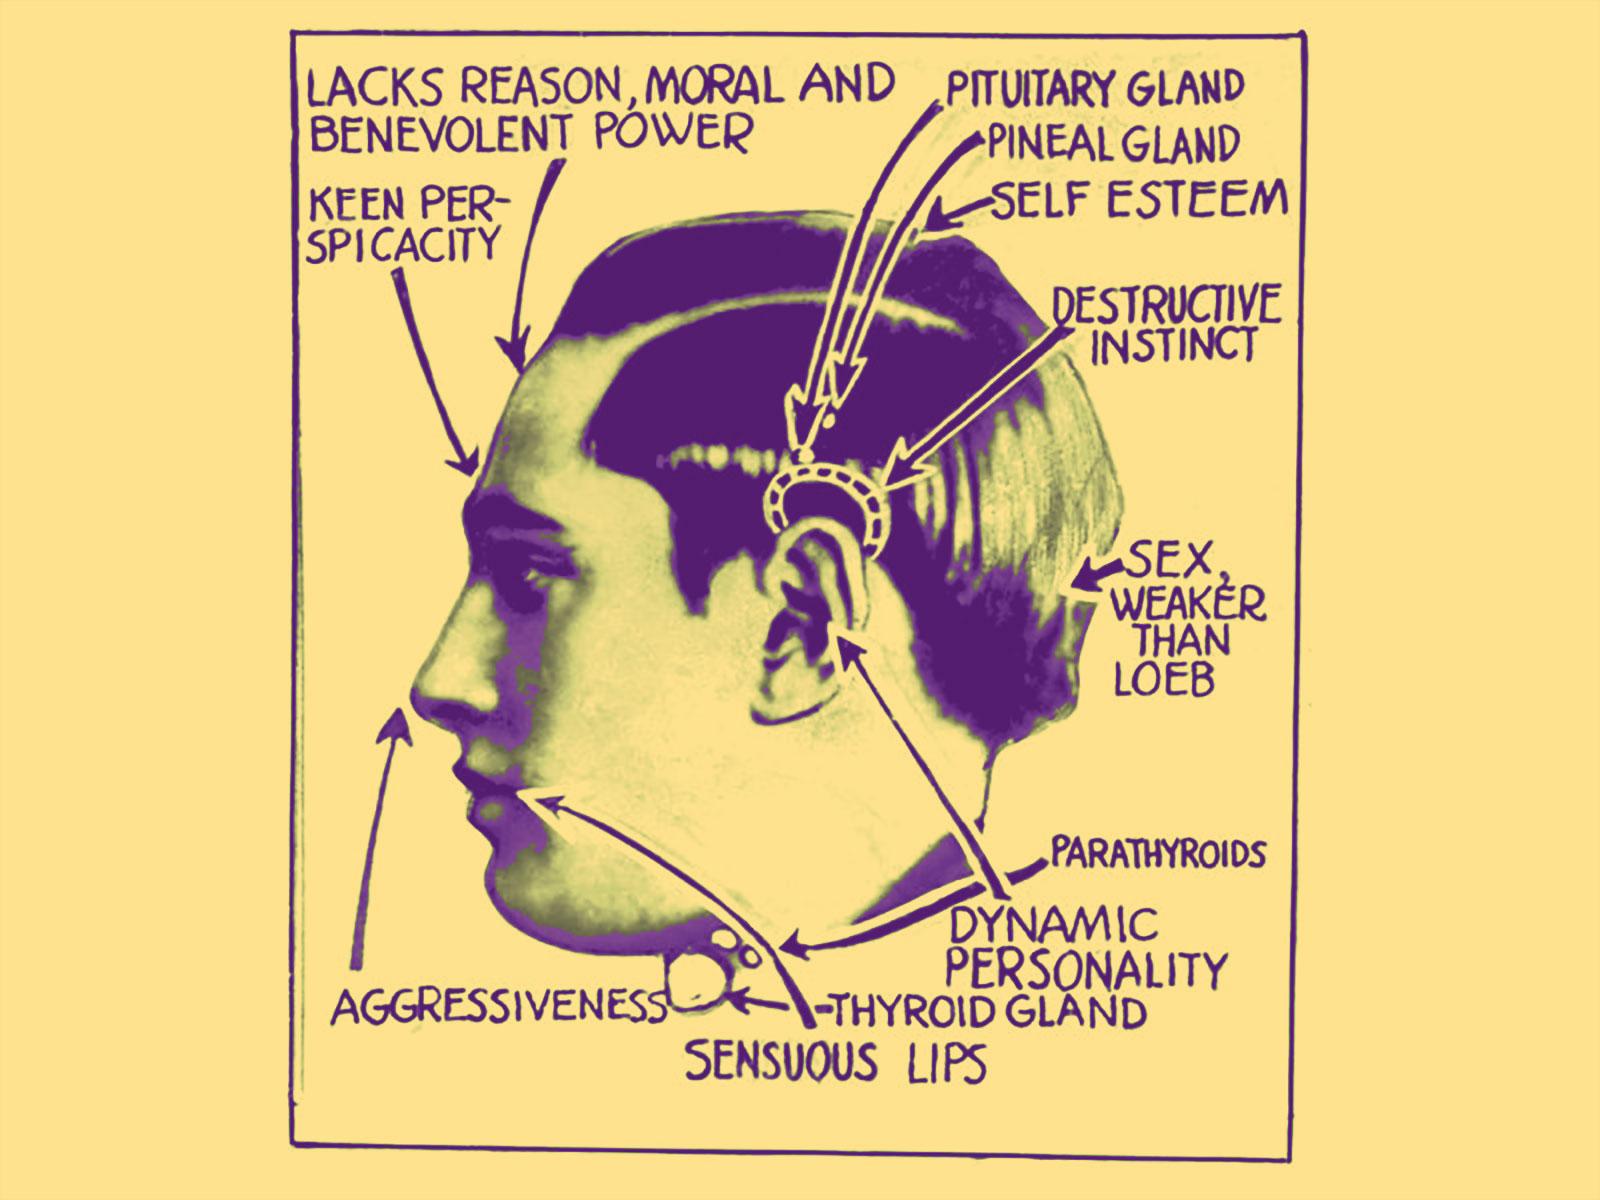 Phrenological Diagram, Leopold and Loeb